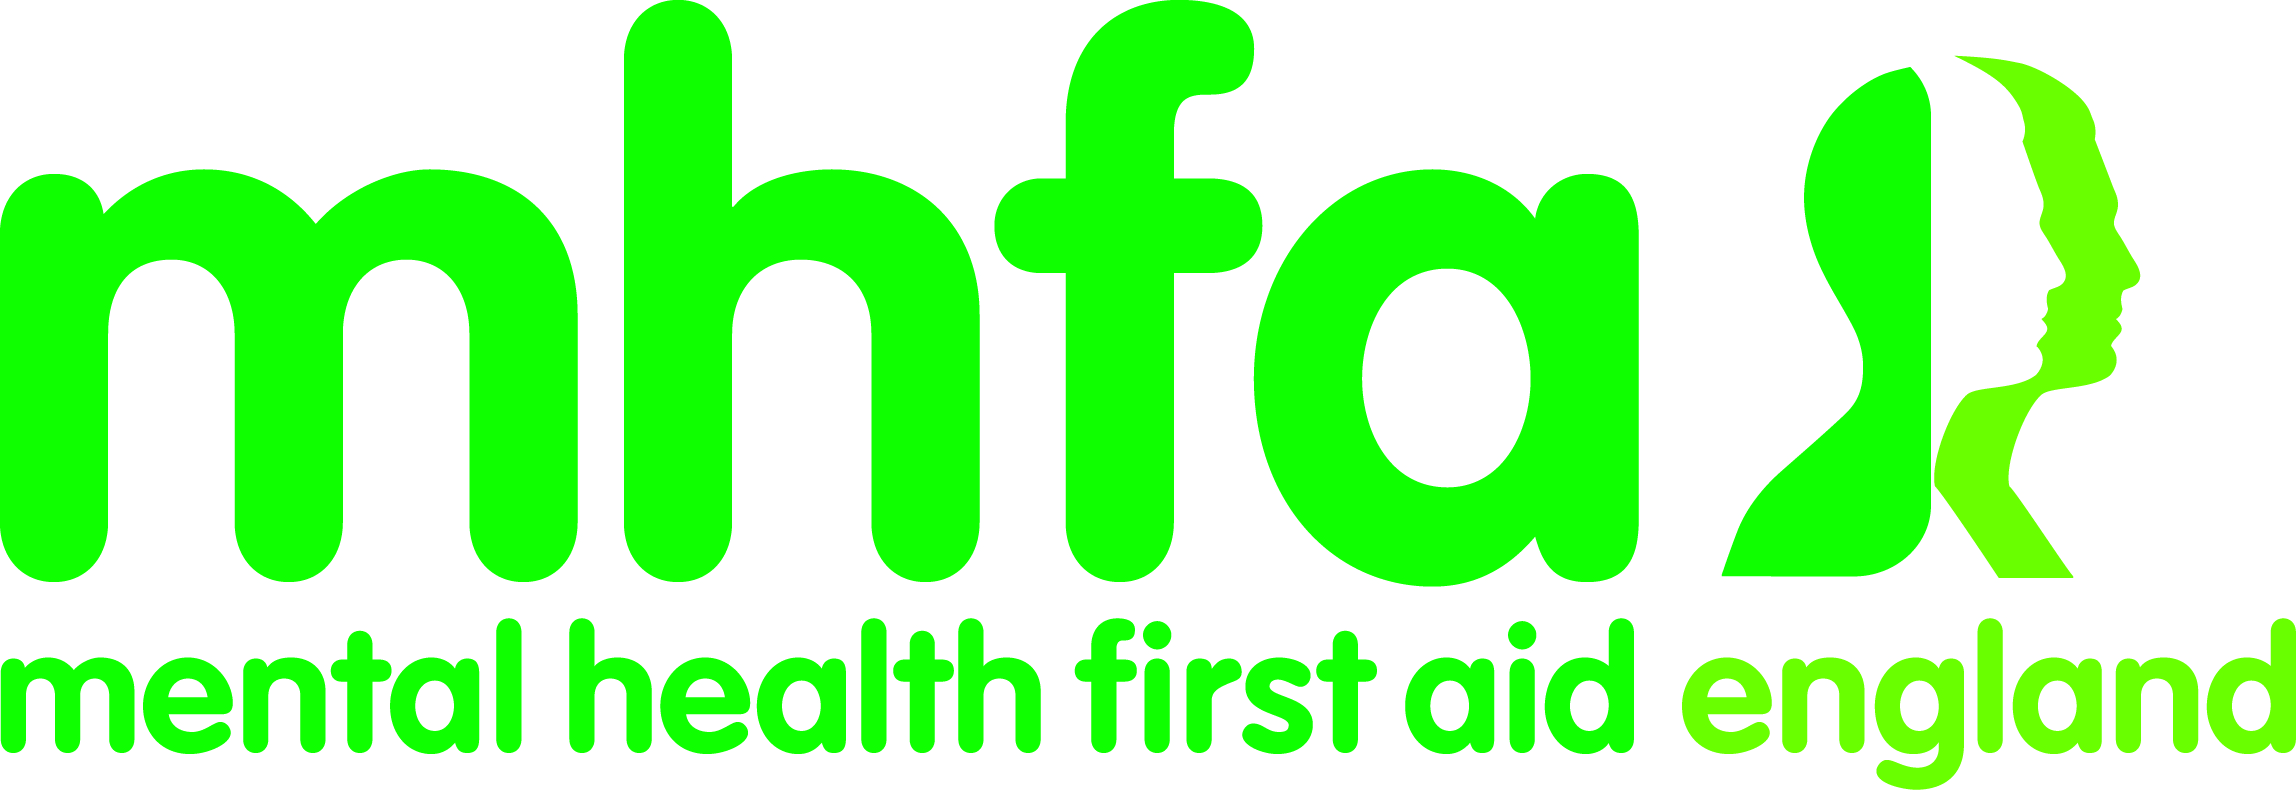 MH First aid